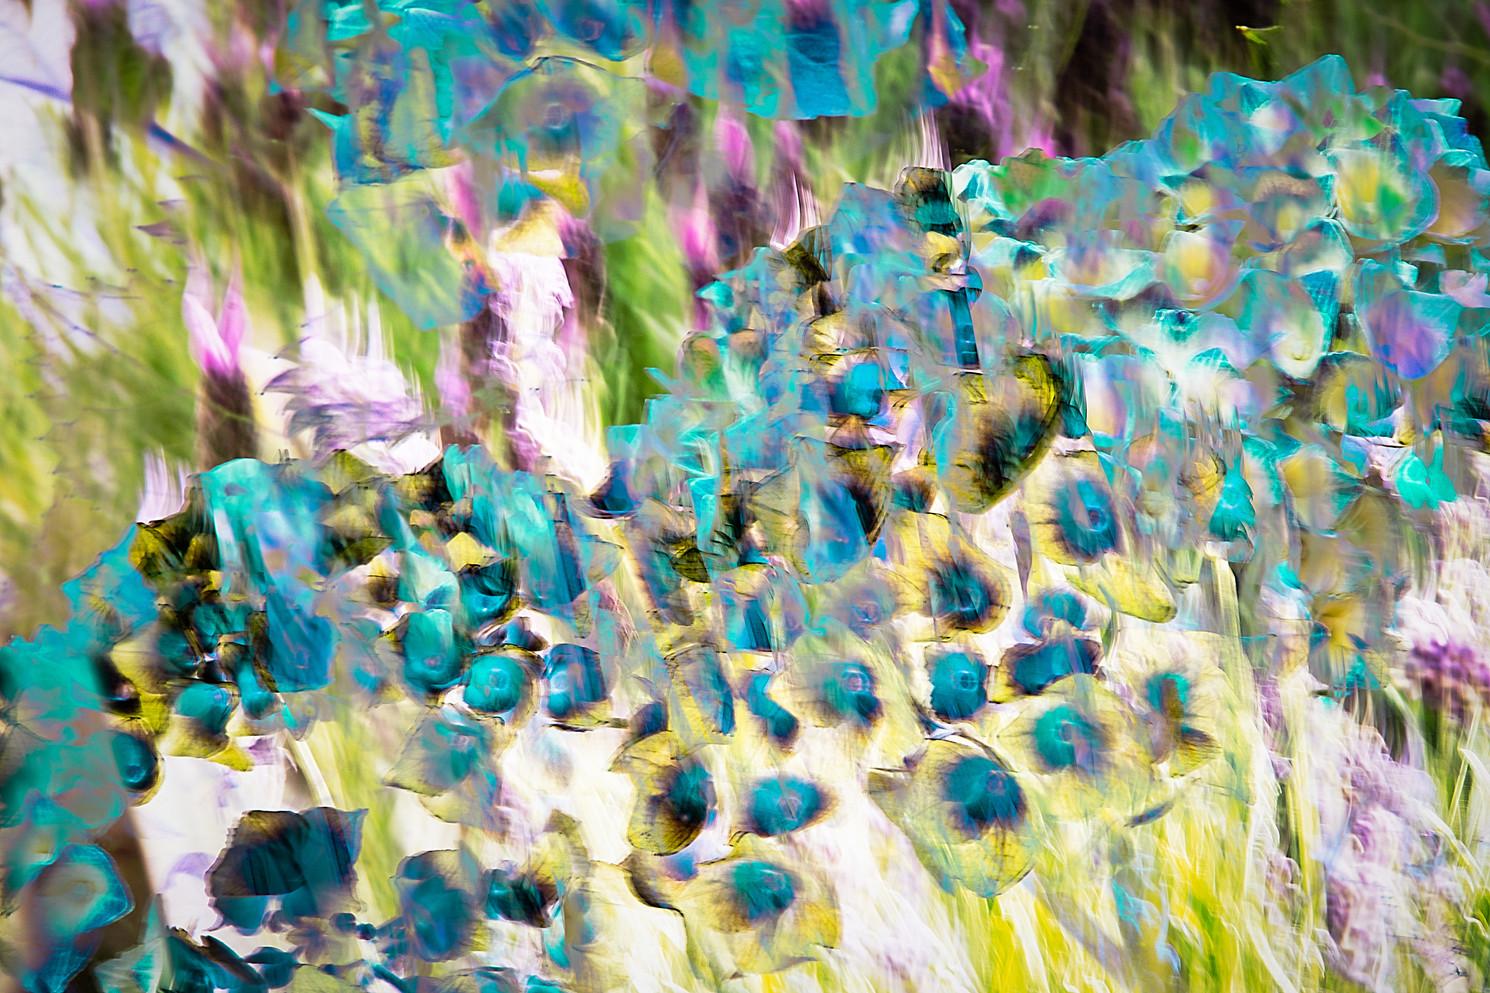 The Garden of Persephone 021